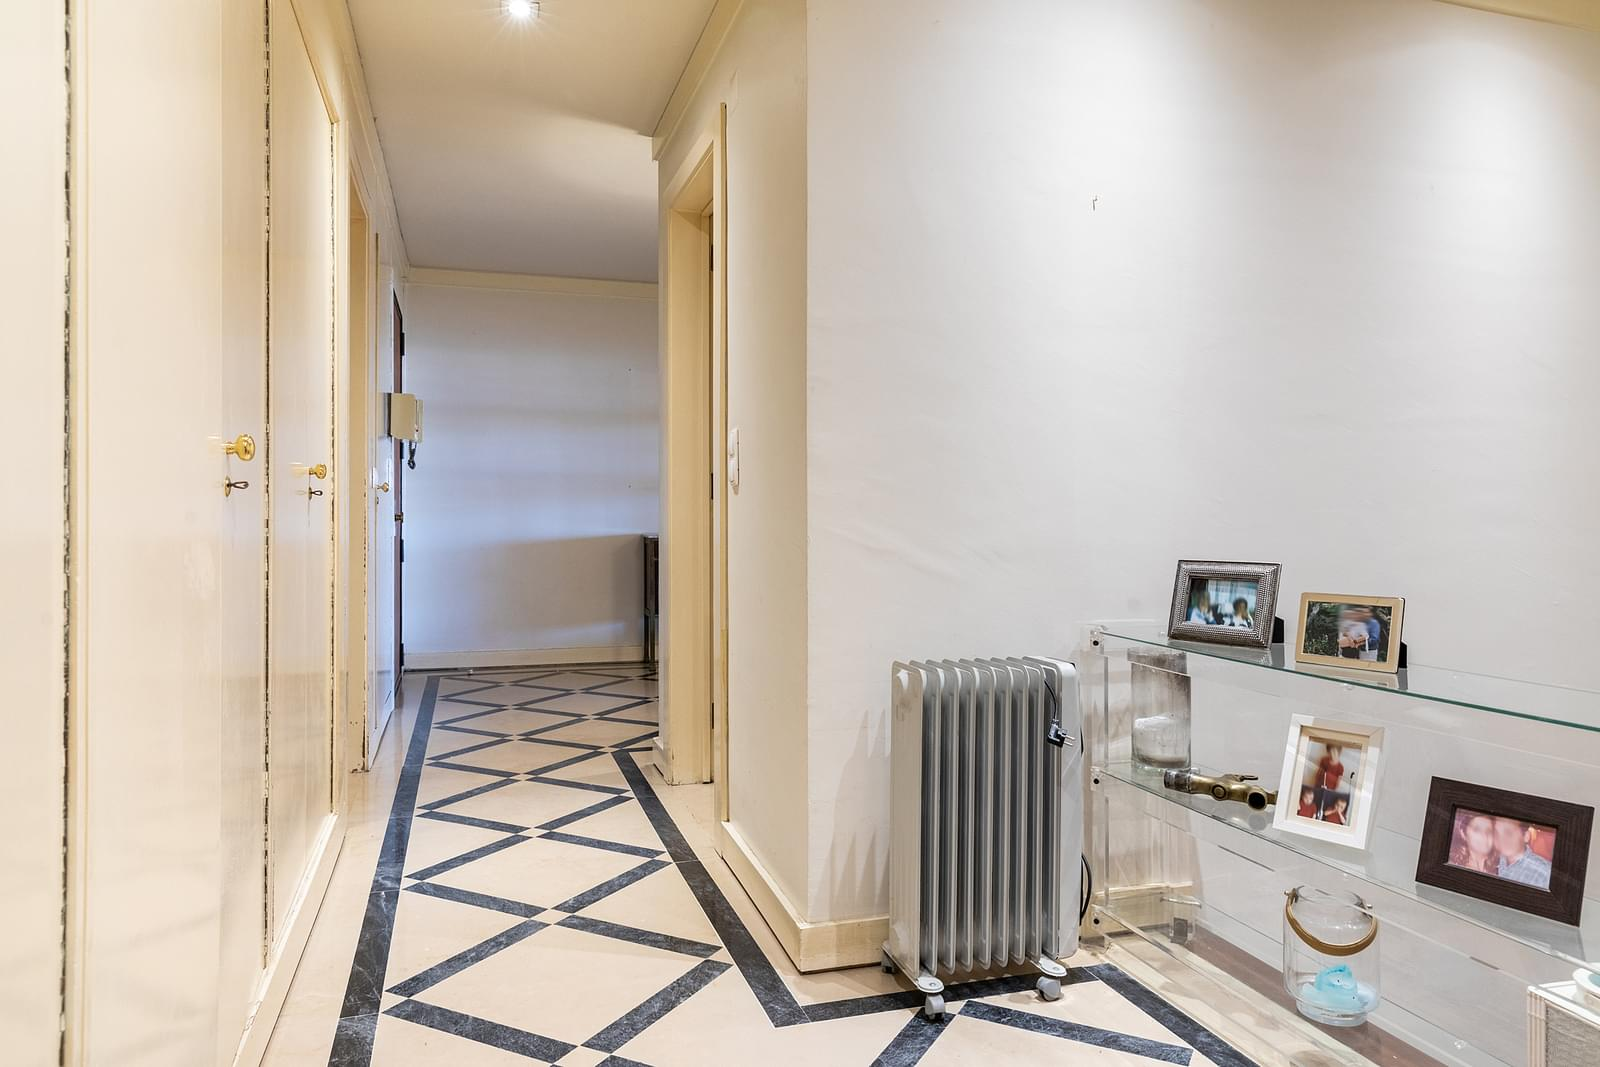 pf18210-apartamento-t4-lisboa-e1c44d78-9d60-41e9-ab77-dc8311d99128